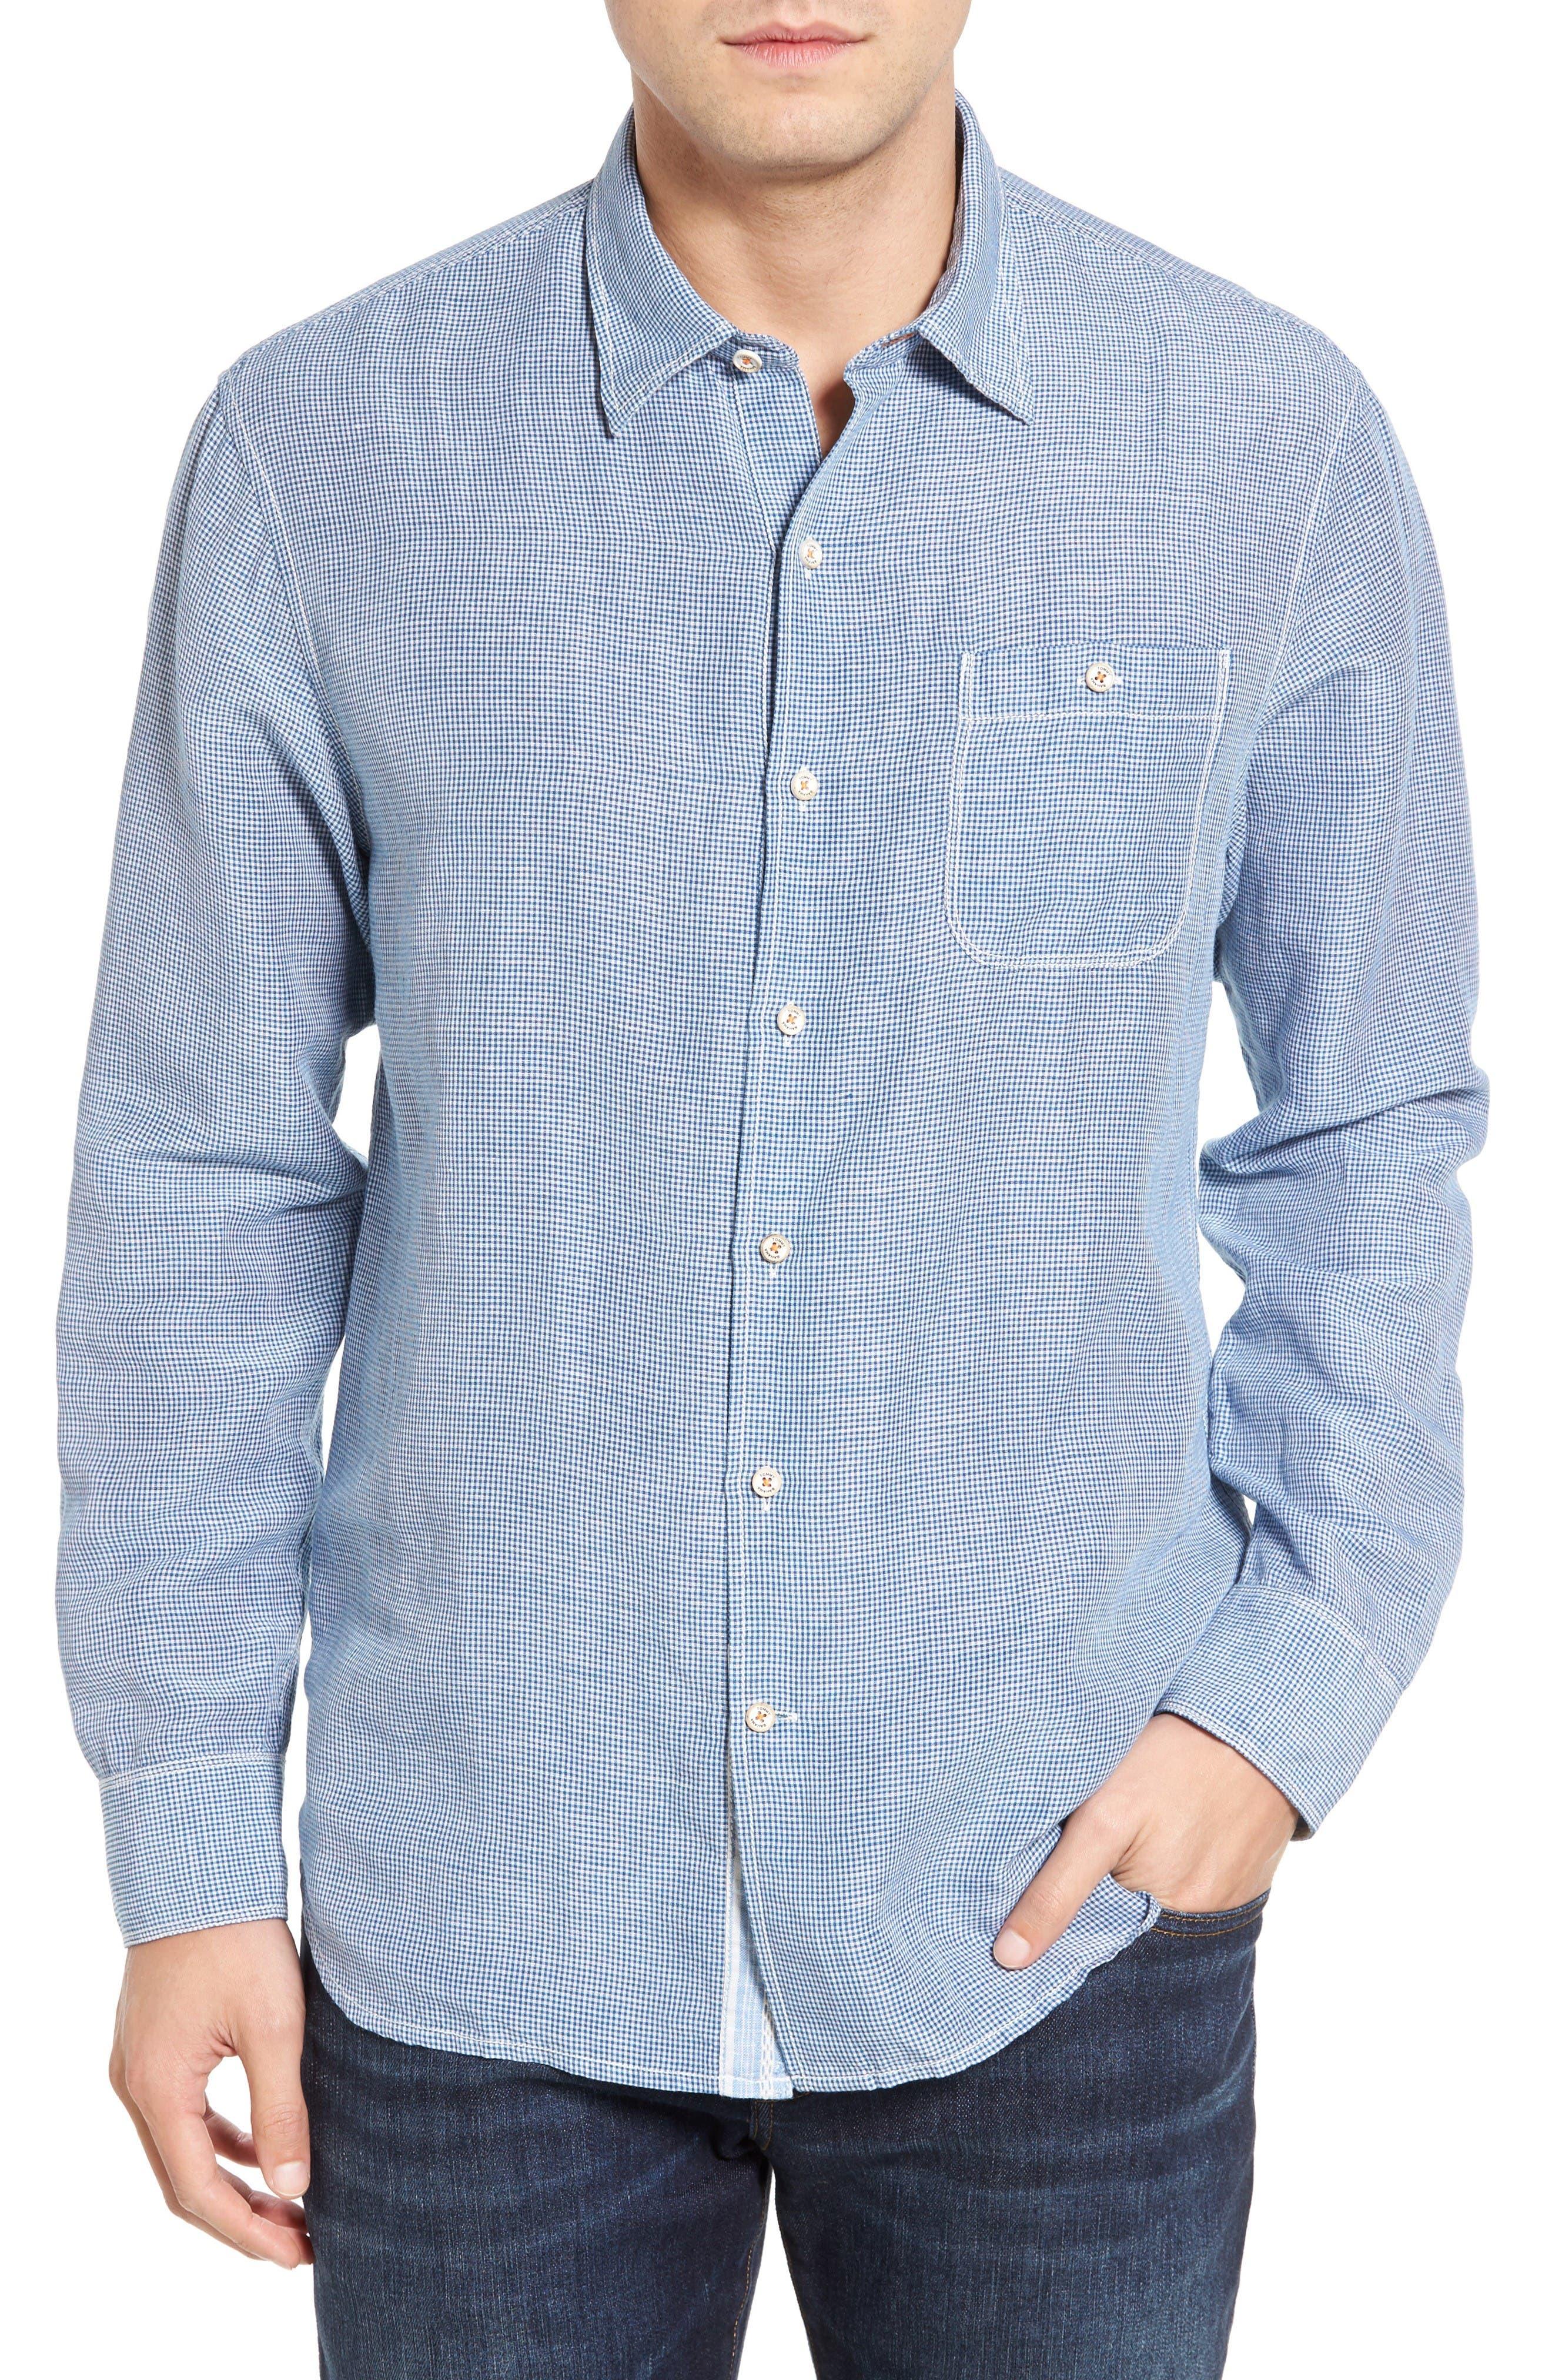 Main Image - Tommy Bahama Sand Linen Island Modern Fit Sport Shirt